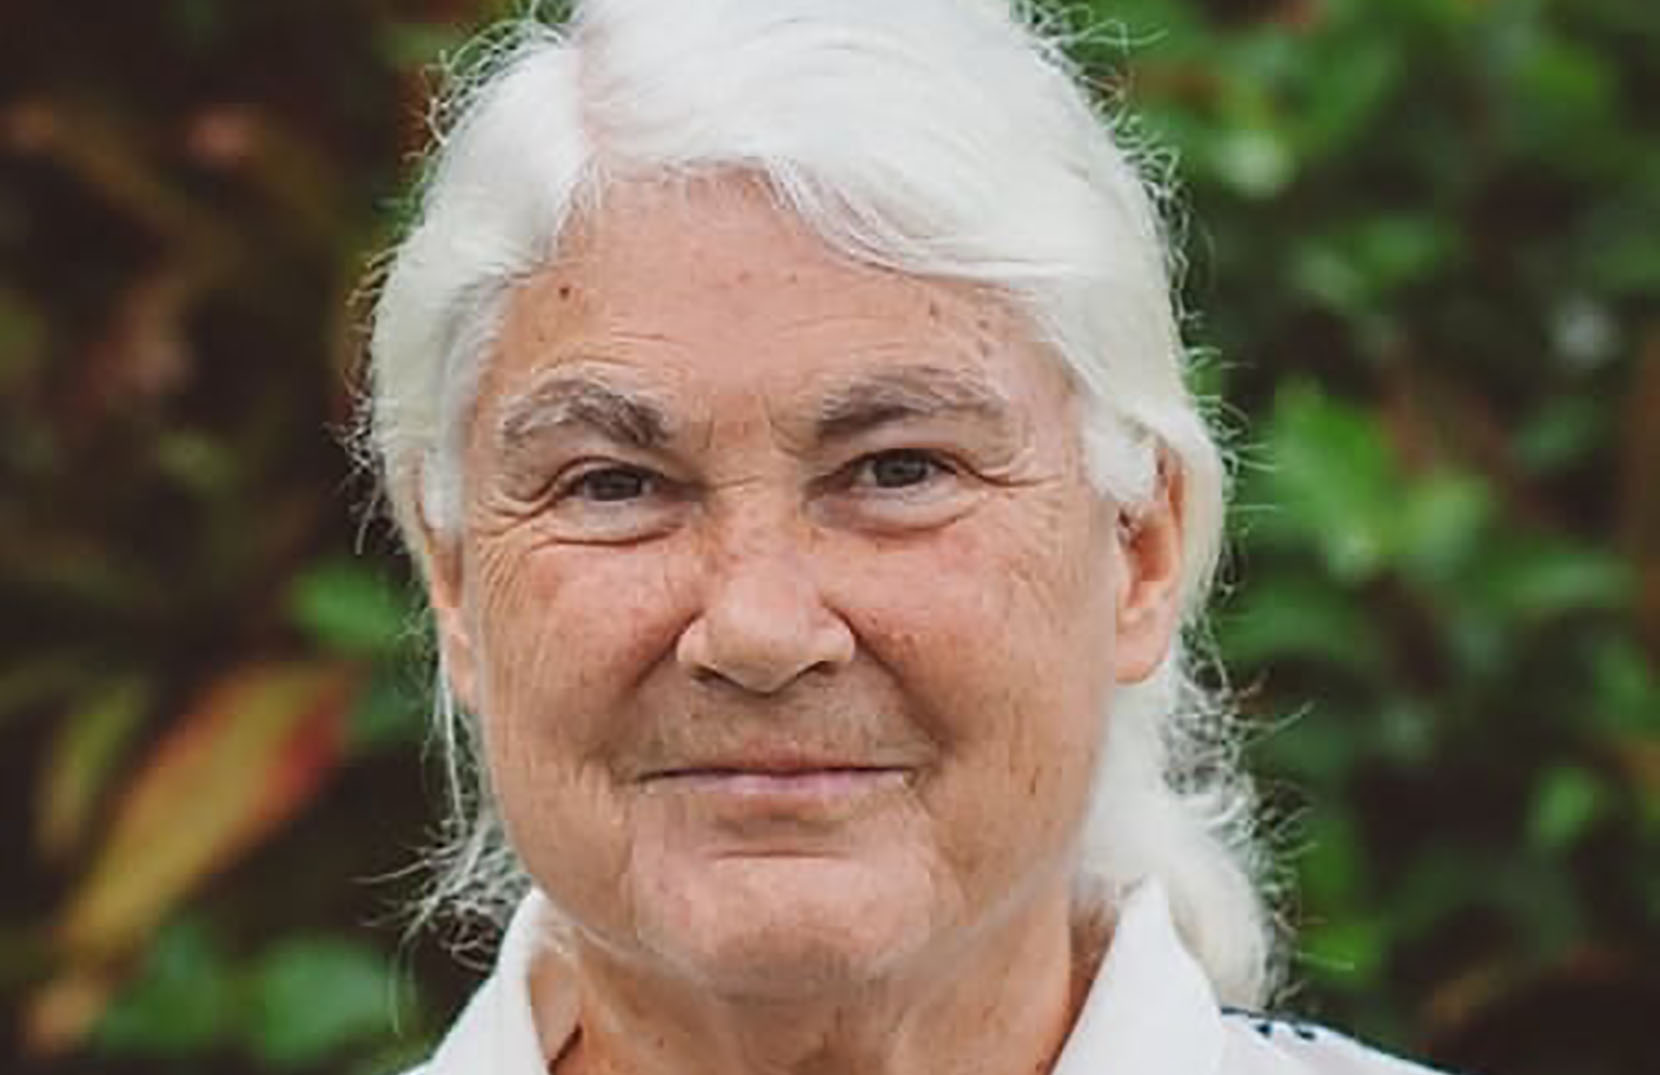 Stephanie Seneff: Glyphosate & COVID-19